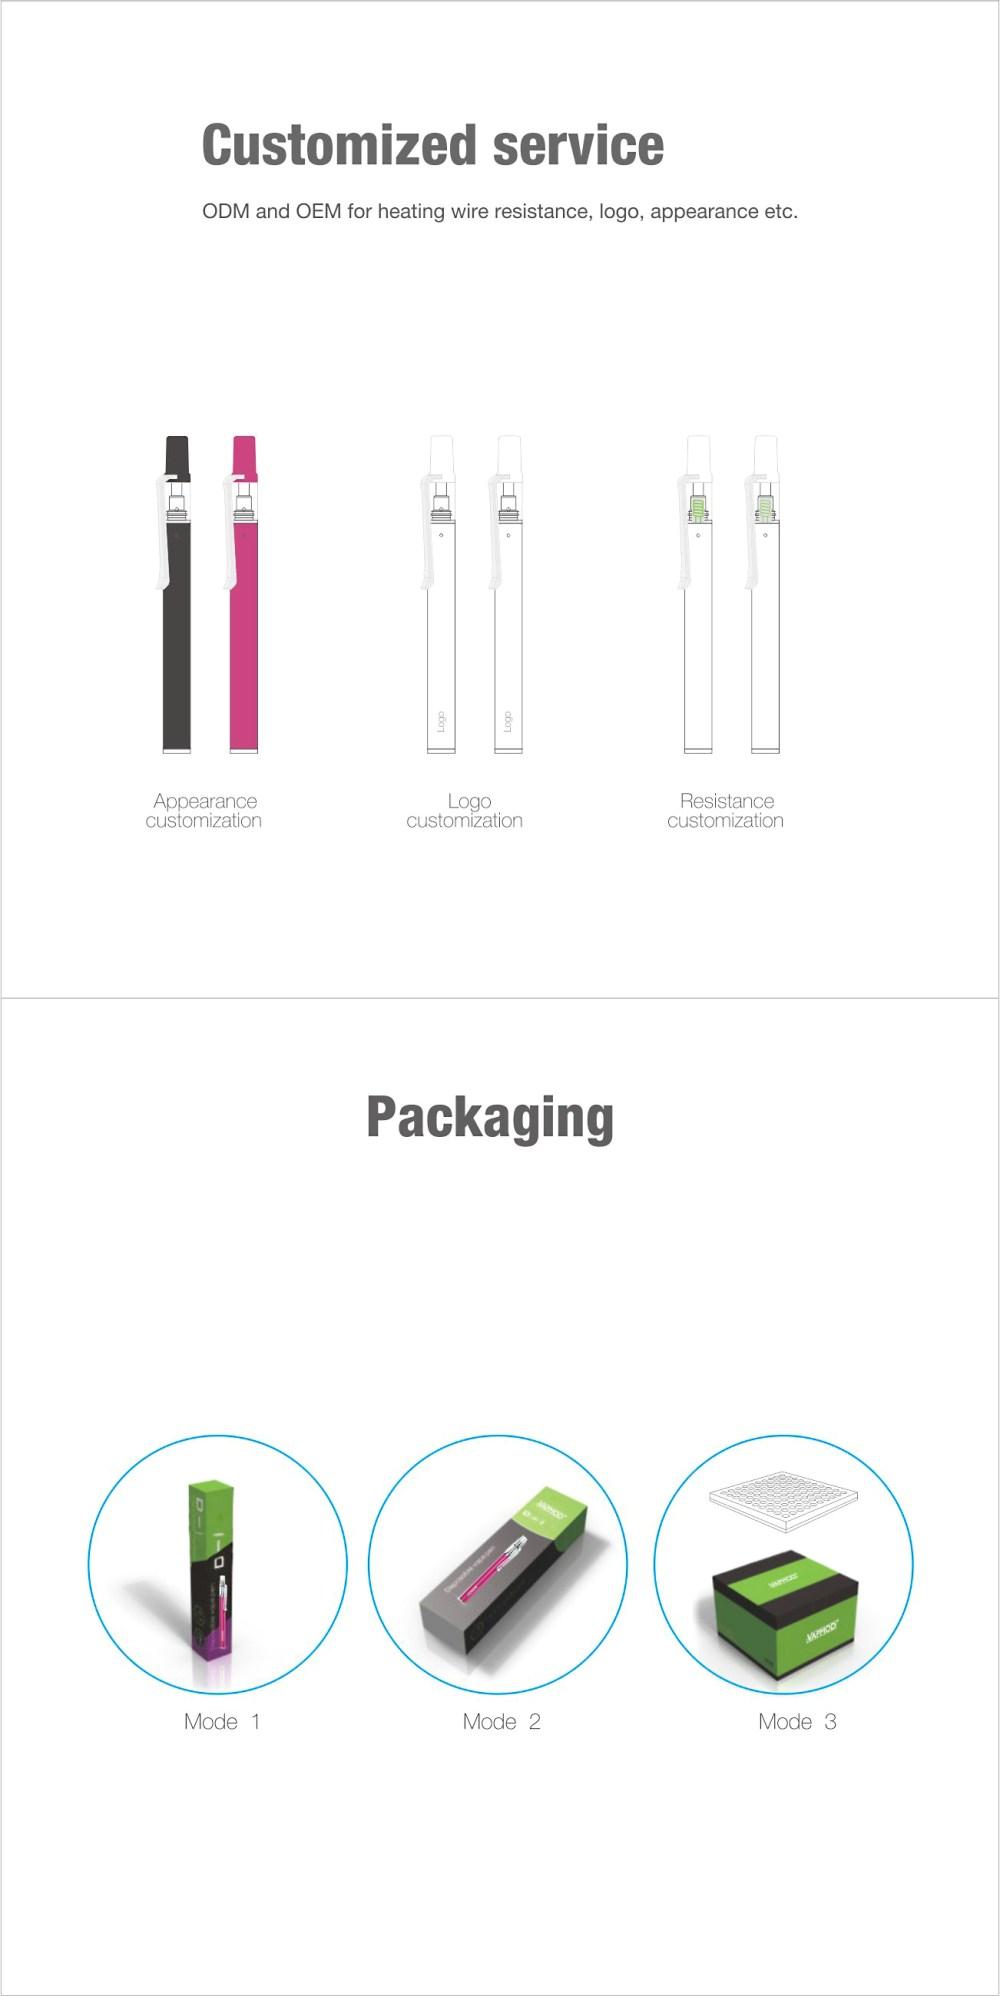 medium resolution of 2018 new product vapmod disposable vape pen cbd oil e pen empty disposable hookah pen